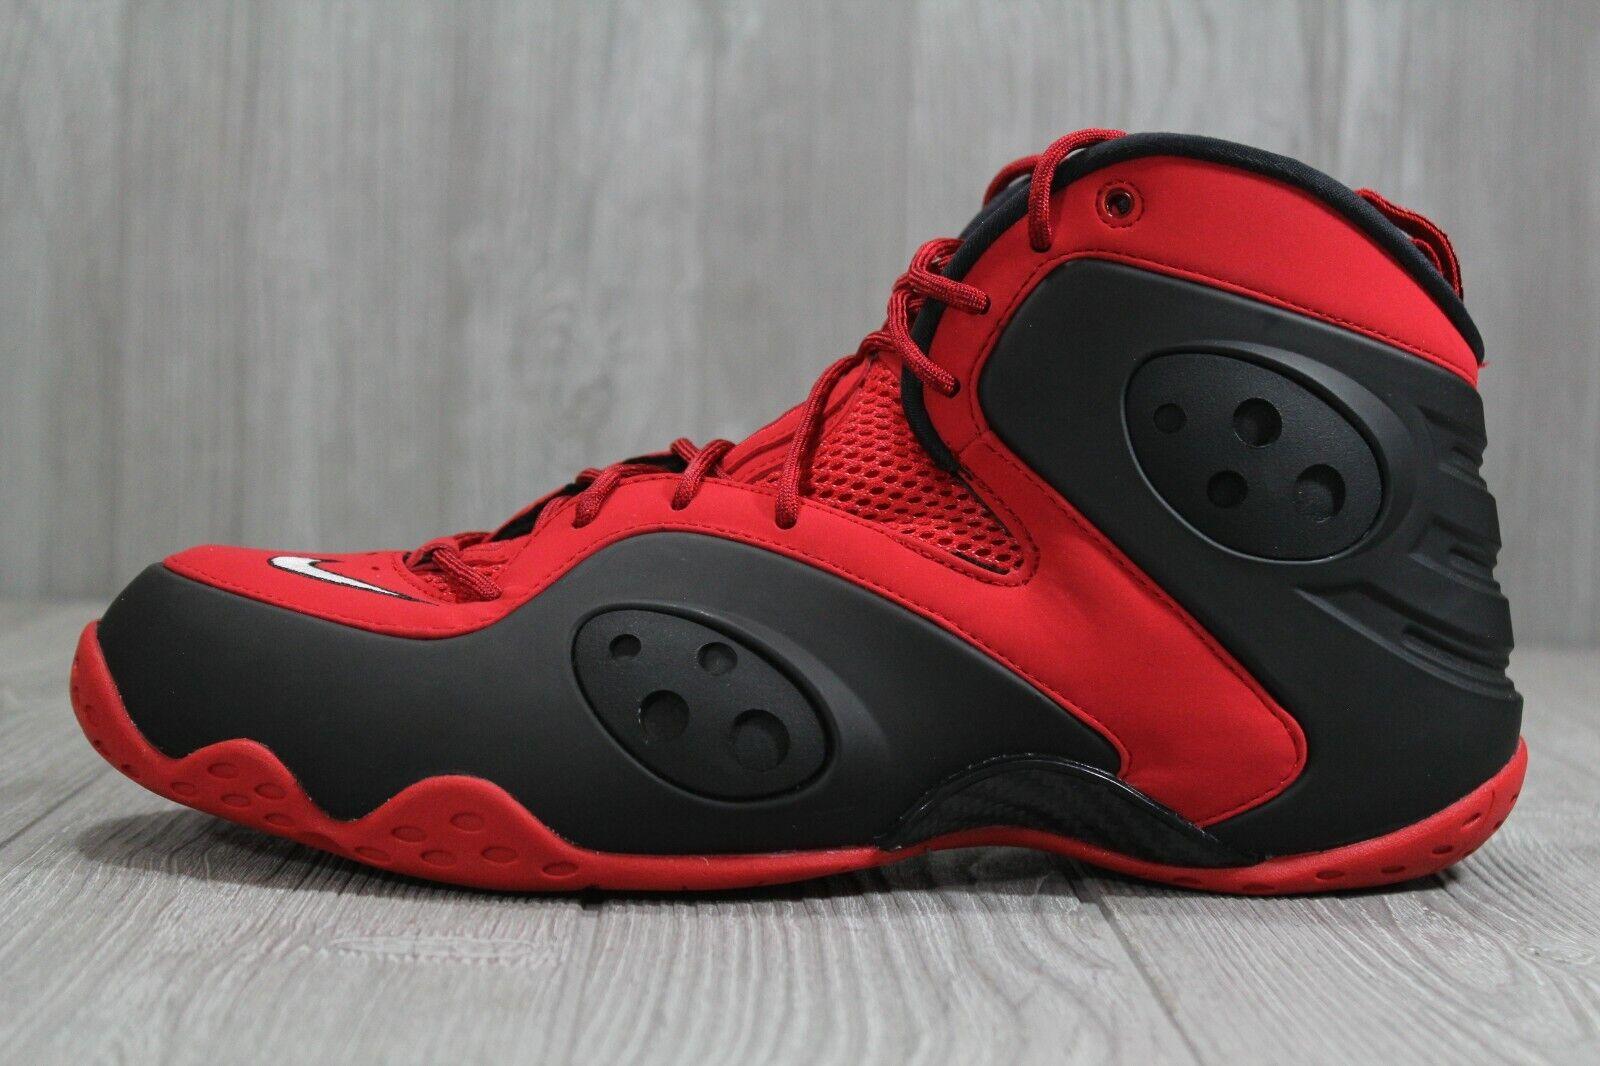 43 Nike Zoom  Rookie University rosso Basketball scarpe Mens Sz 12, 15 BQ3379 -600  di moda